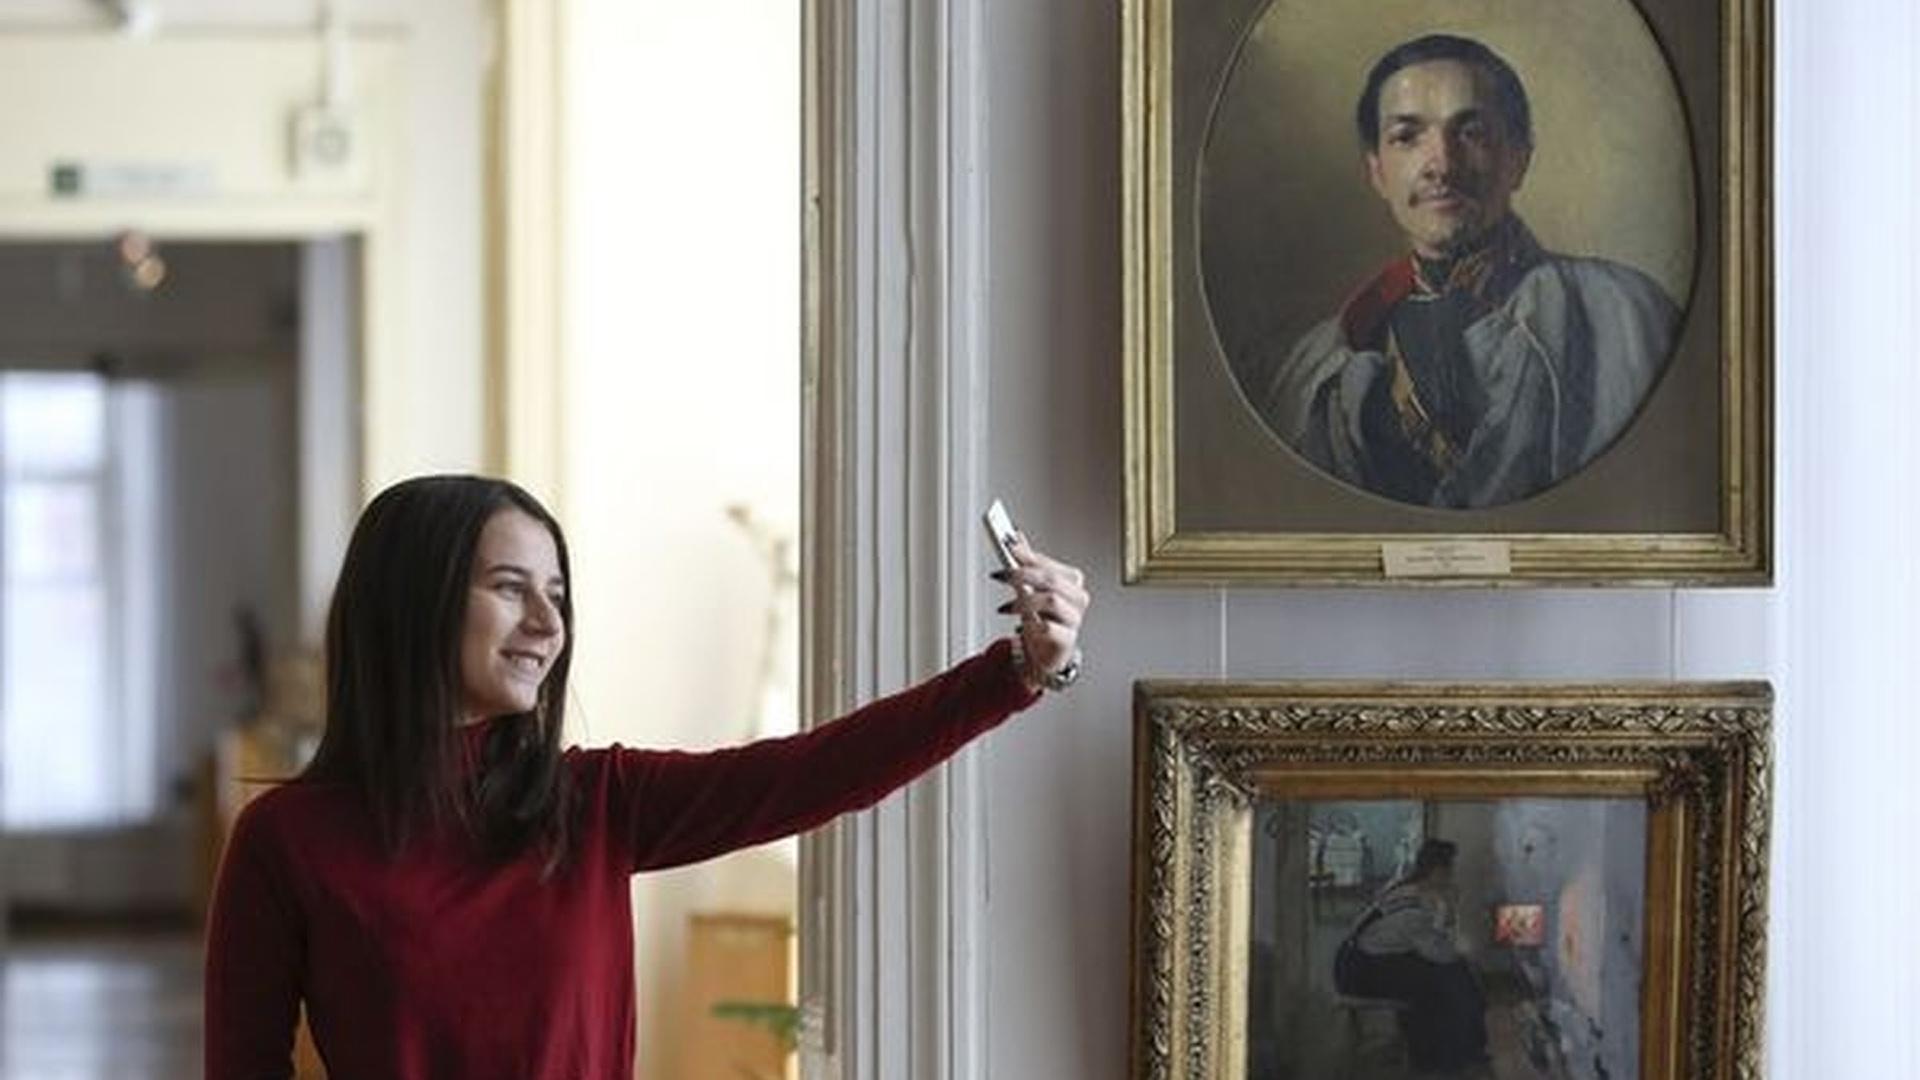 Selfie en el Museo de Arte de Ryazan, en Rusia (Foto: Alexander Ryumin/Getty Images)